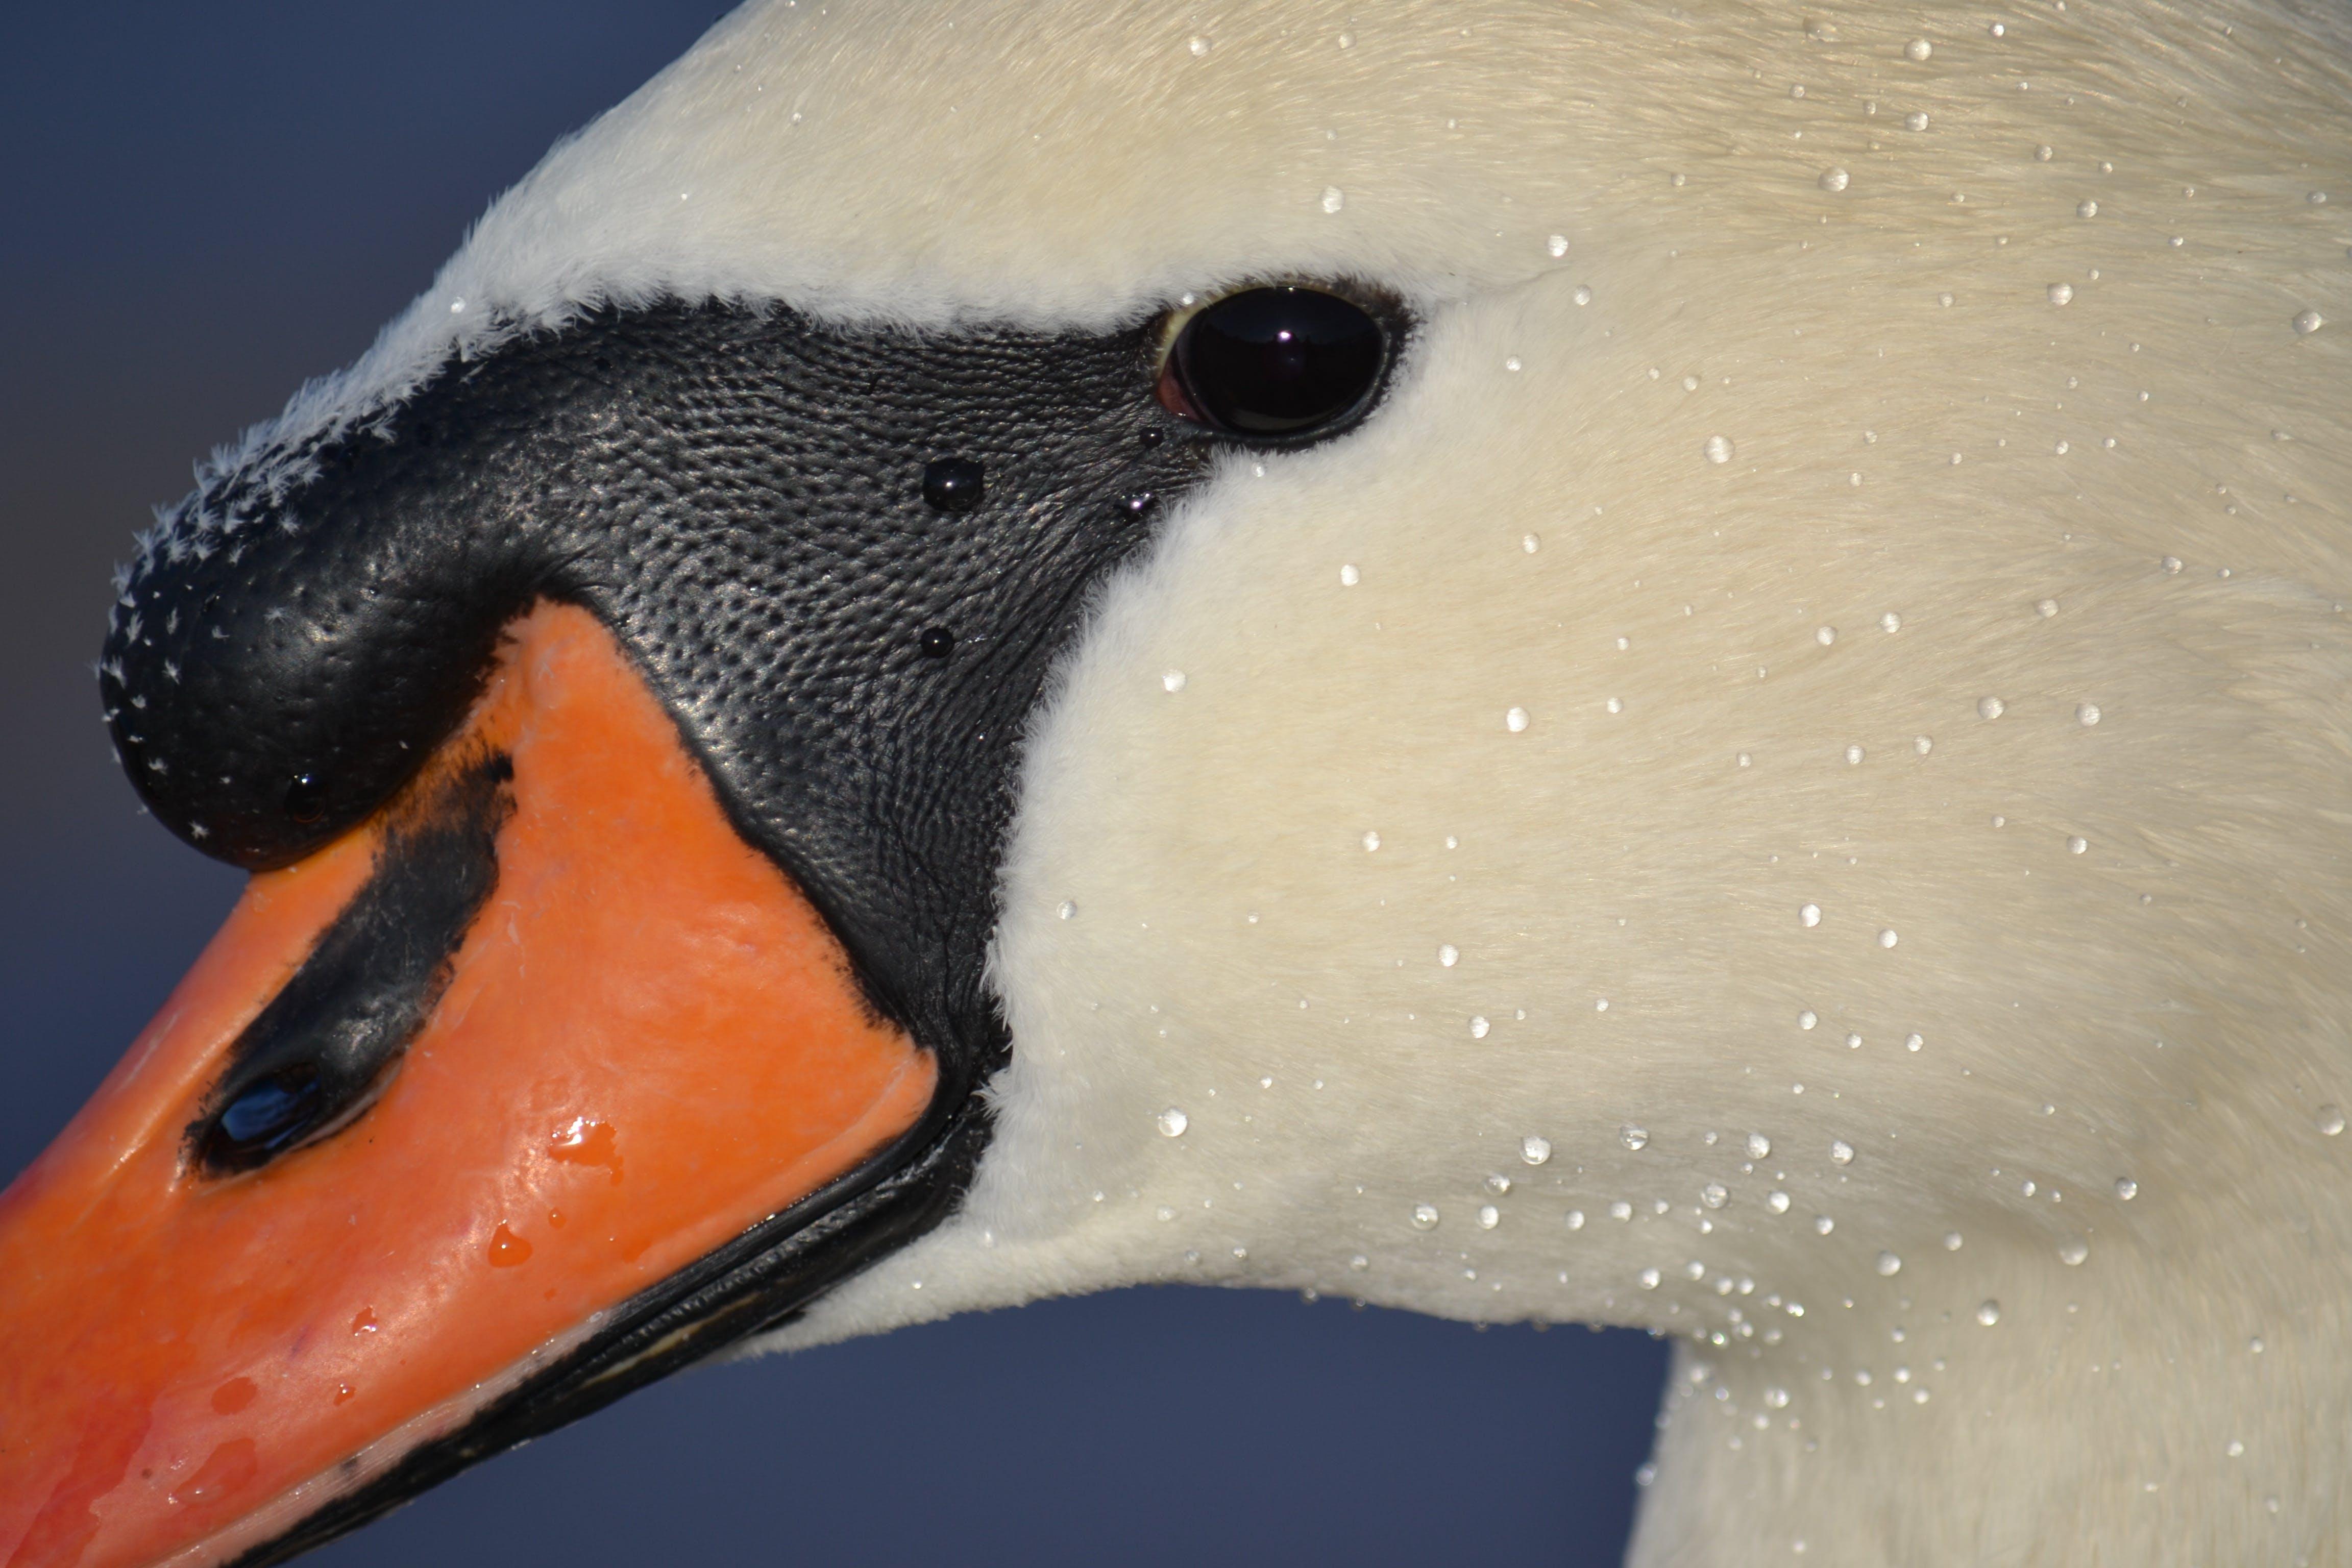 Free stock photo of animal, drop of water, swan, eye